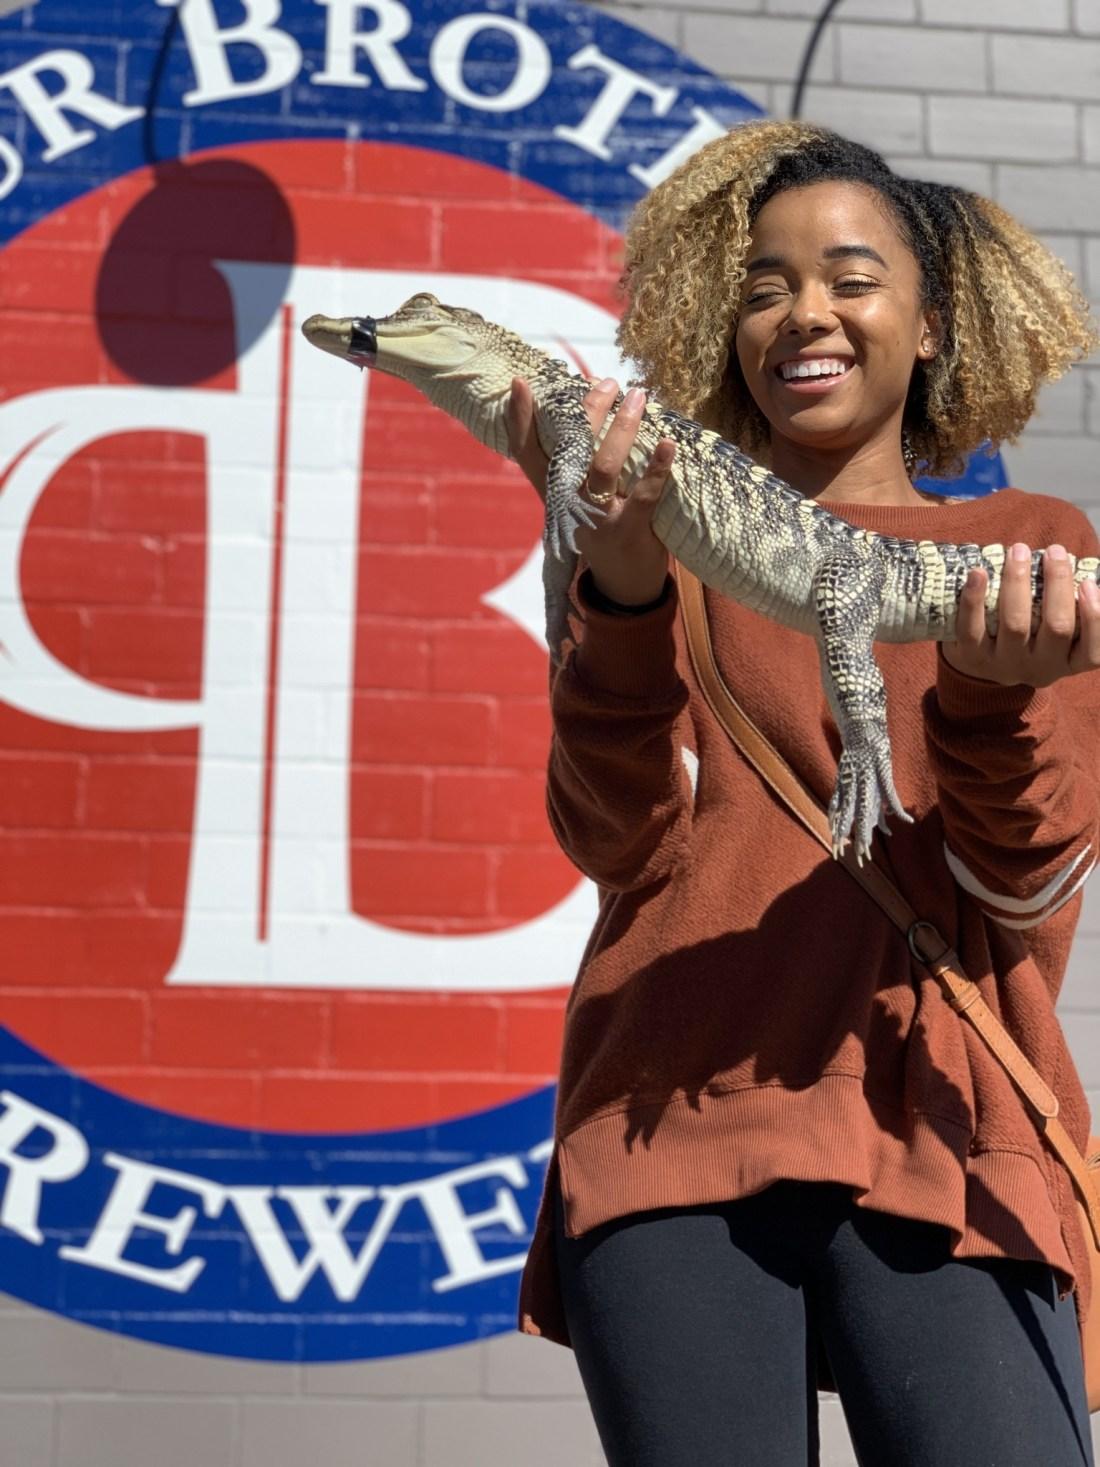 Woman holding alligator